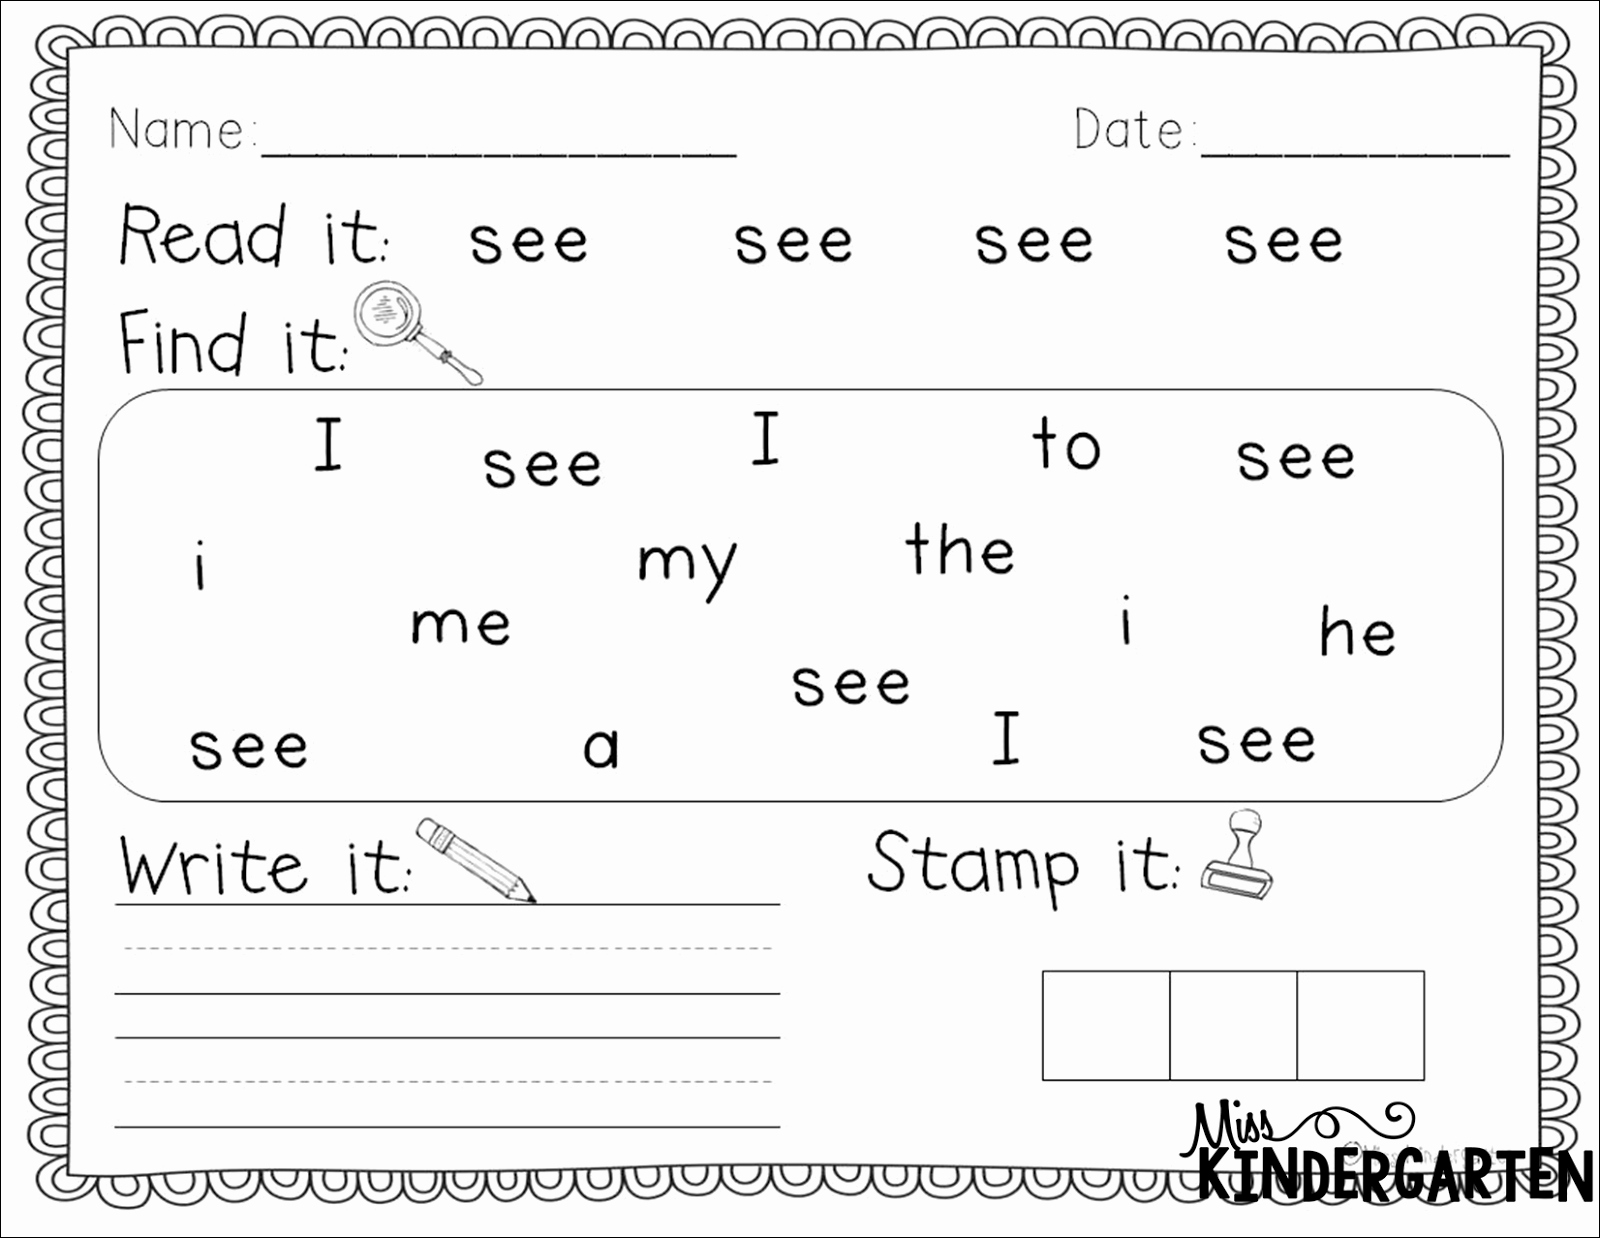 50 Sight Words Worksheet For Kindergarten